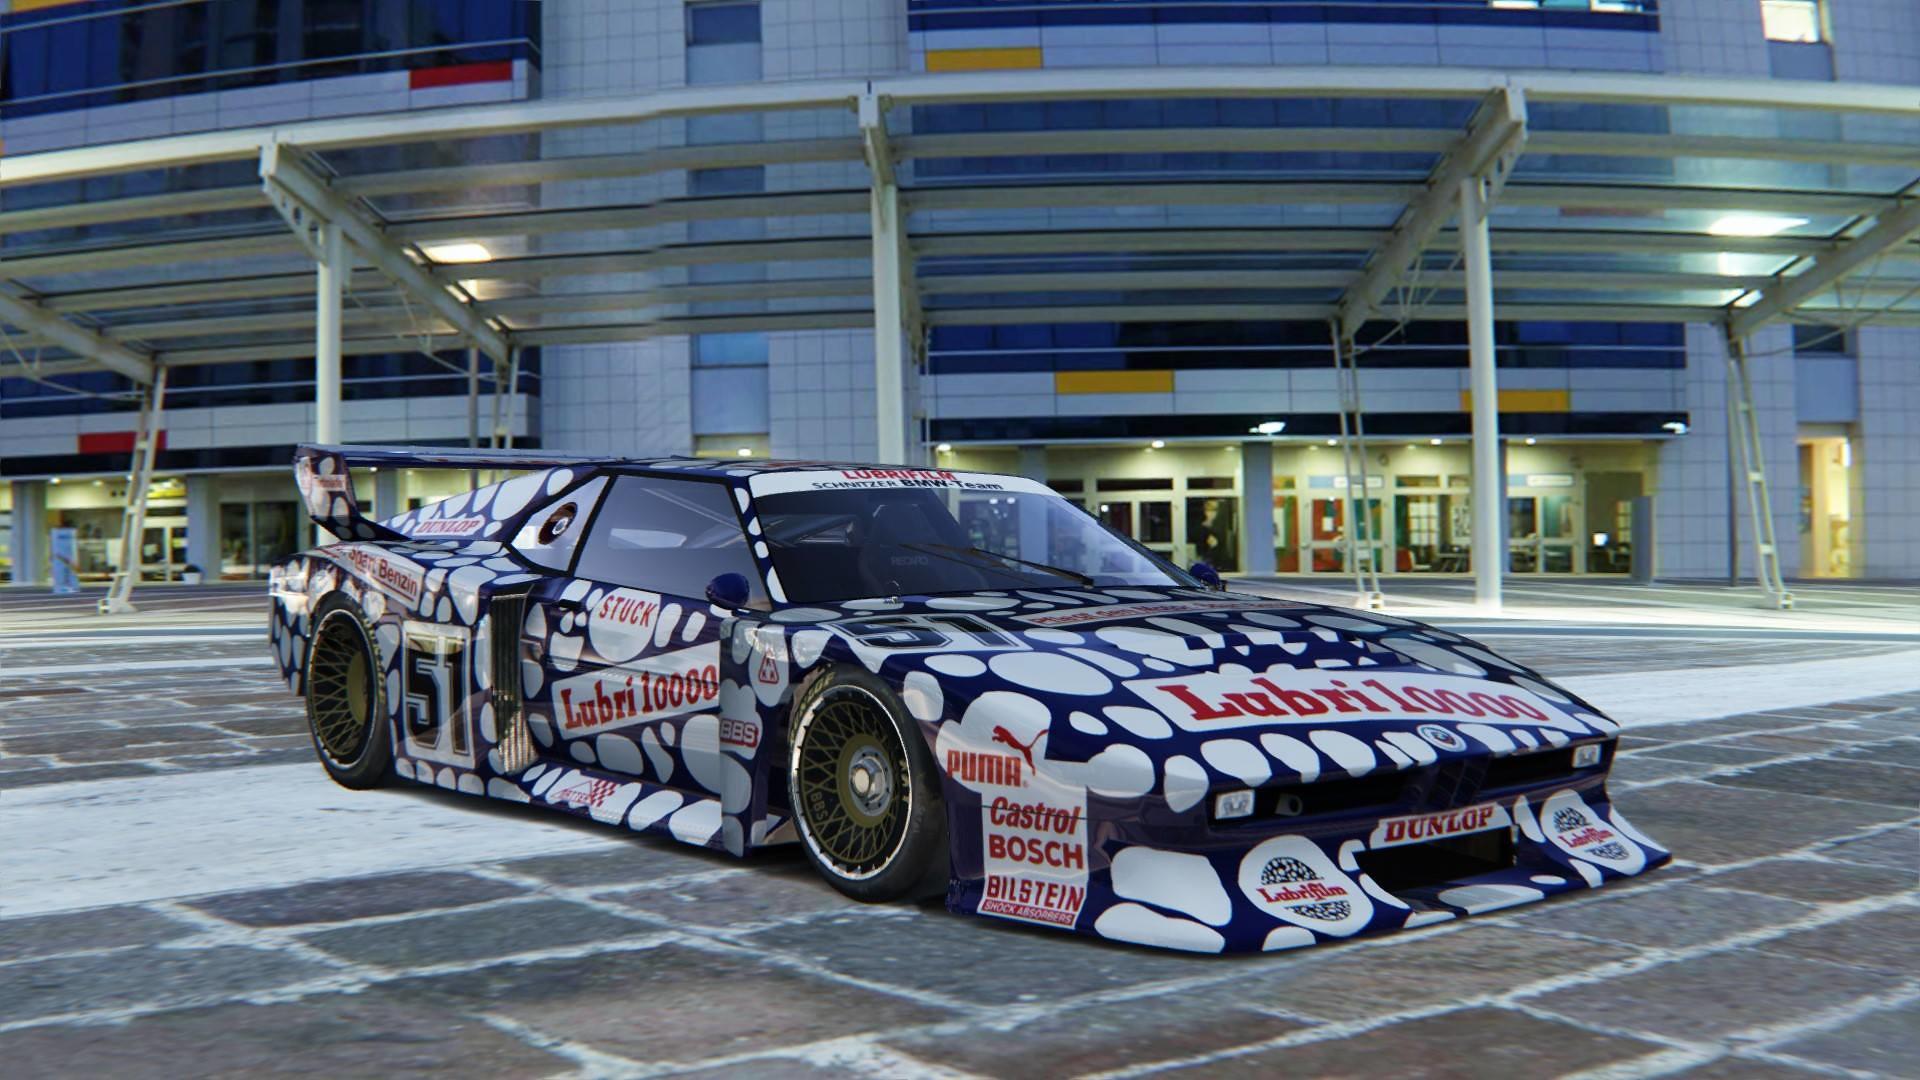 DRm Modding Team BMW M1 Turbo